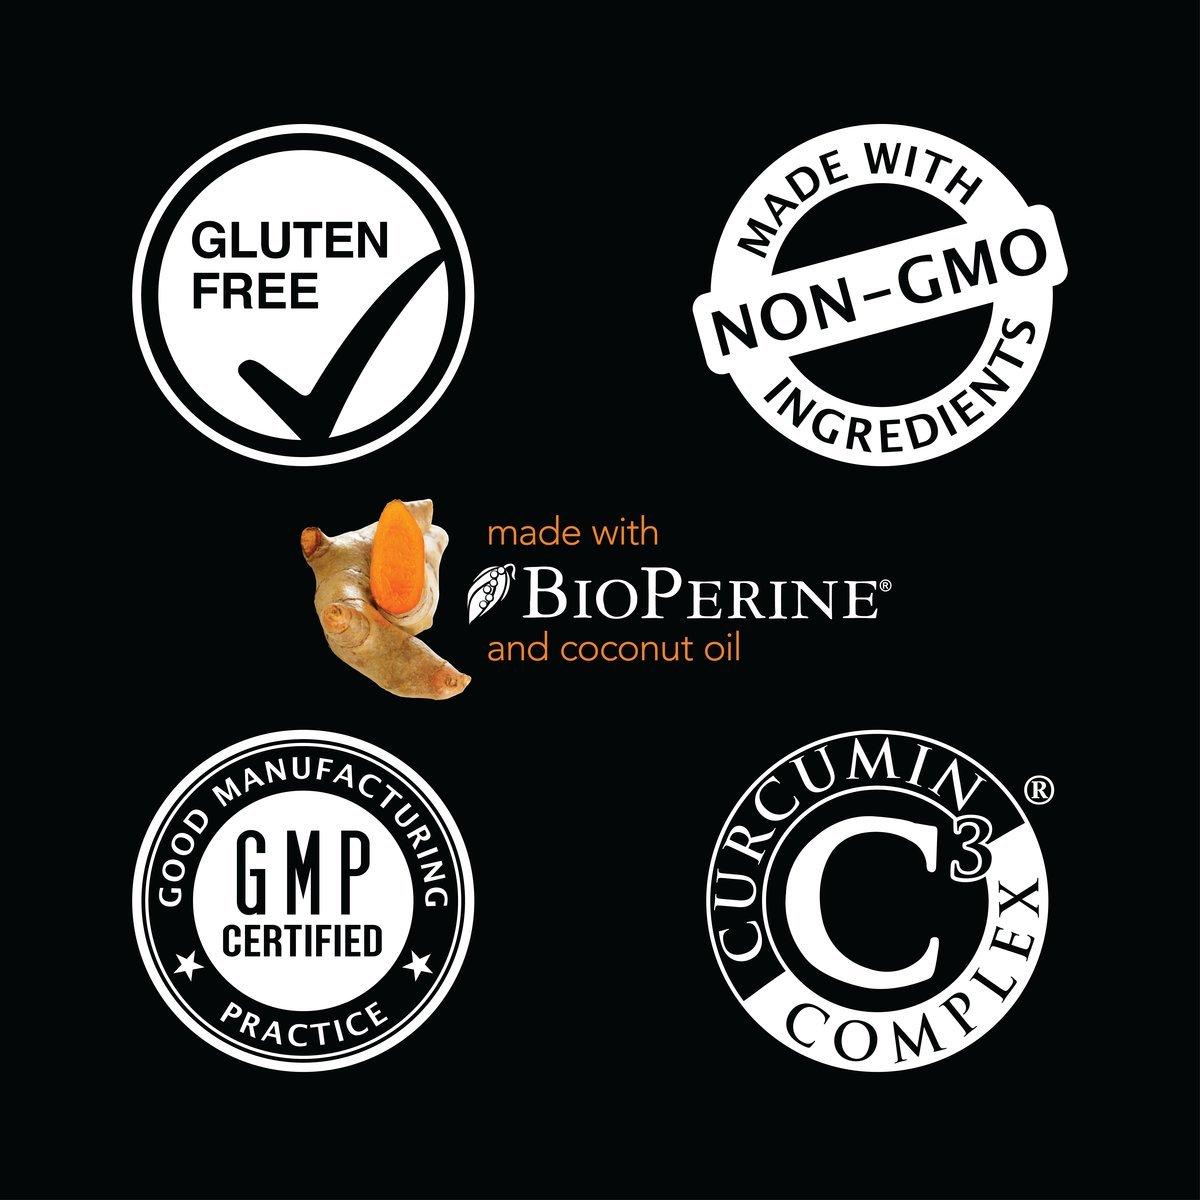 Turmeric Curcumin C3® Complex (500mg) Enhanced with Black Pepper & Organic Coconut Oil for Better Absorption; Non-GMO & Gluten Free (60 Liquid softgels)